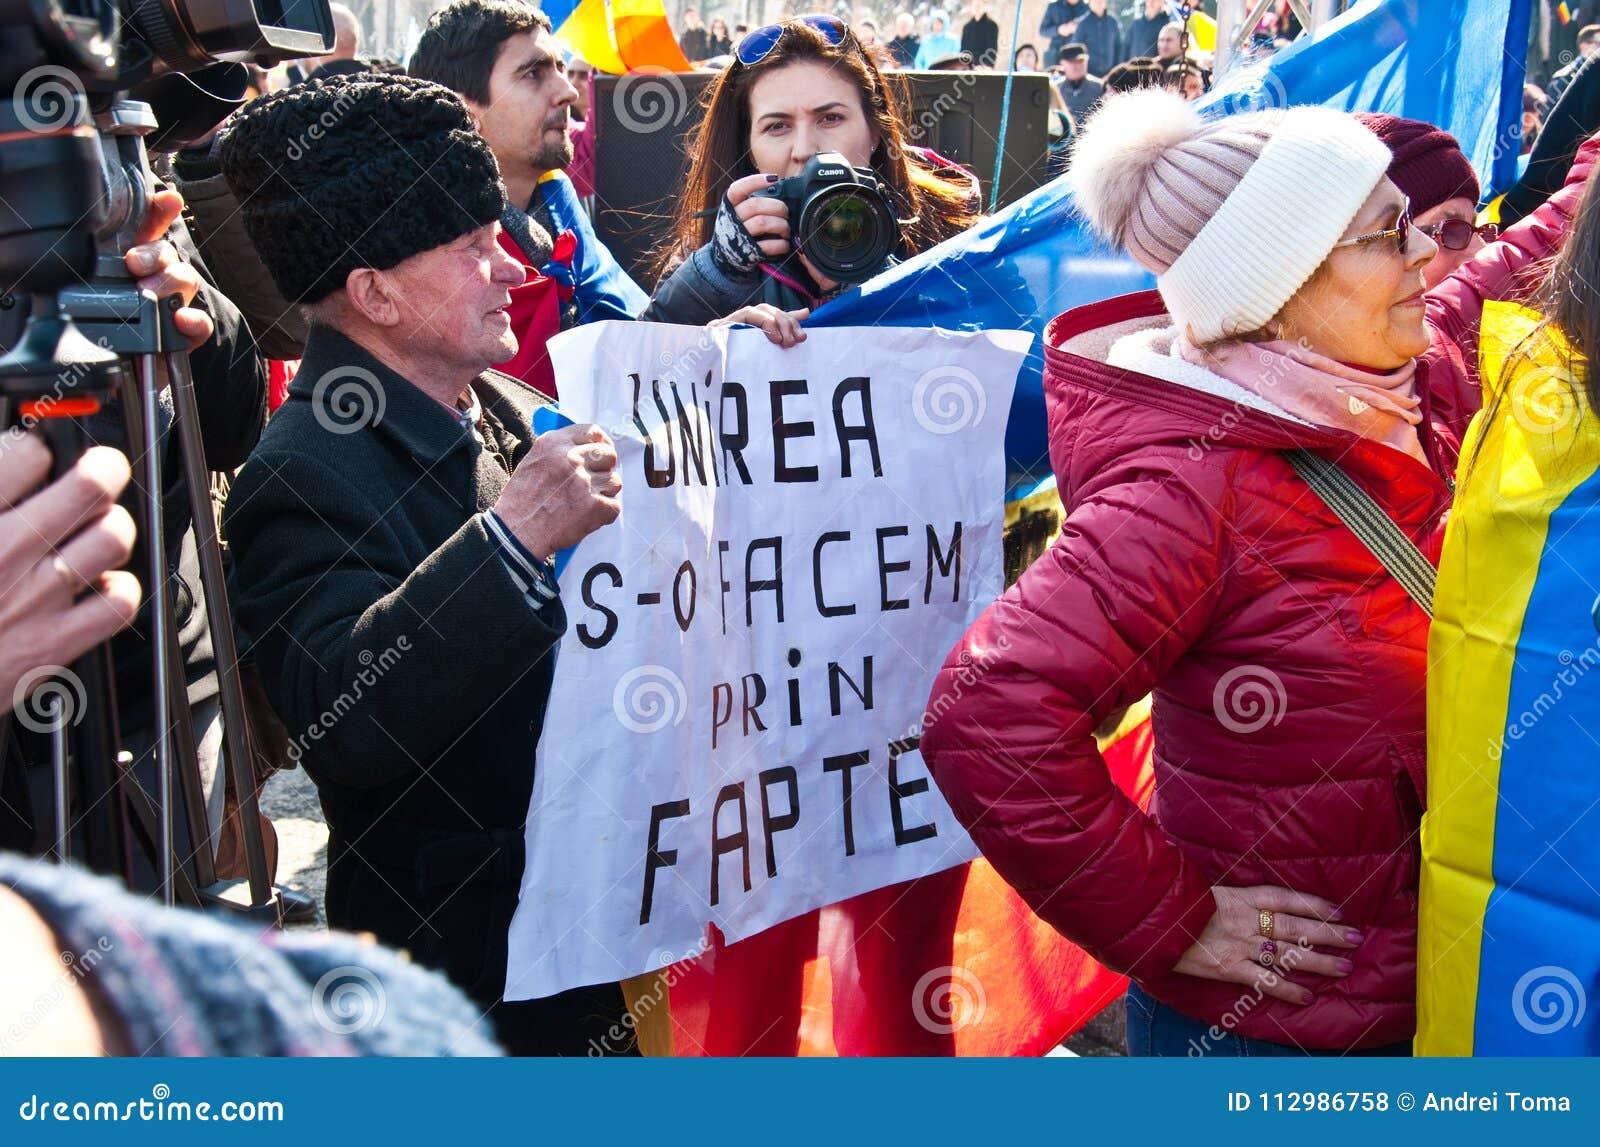 Chisinau, Republic of Moldova, March, 25th, 2018, Great Centenary Assembly